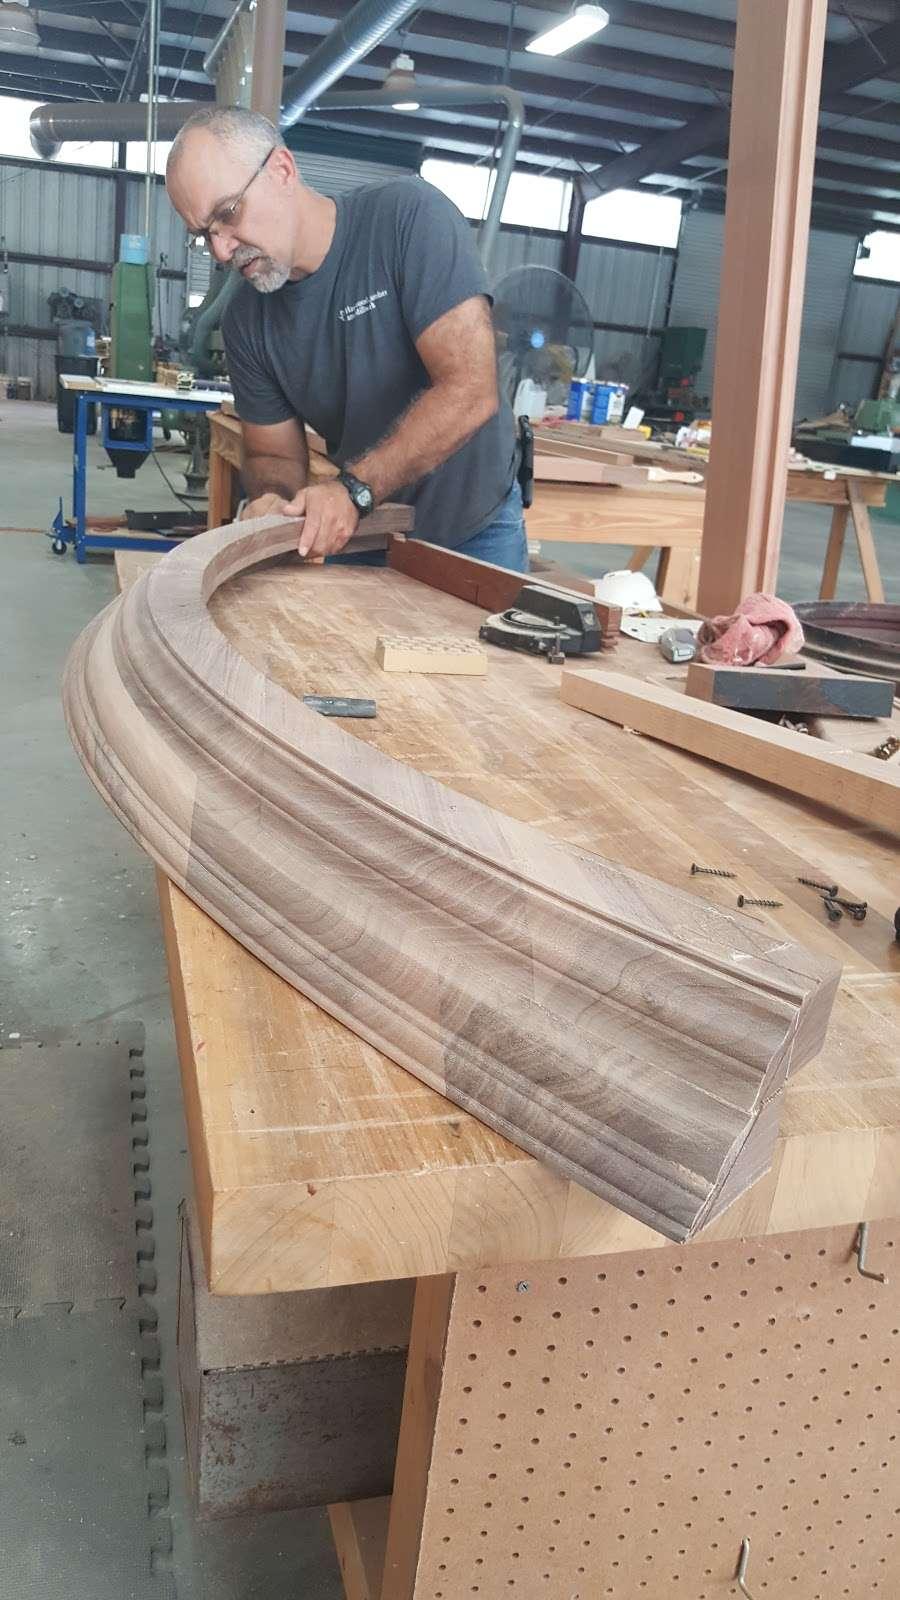 Hardwood Lumber & Millwork - store  | Photo 8 of 10 | Address: 4316 Wallace Rd, Lakeland, FL 33812, USA | Phone: (863) 646-8681